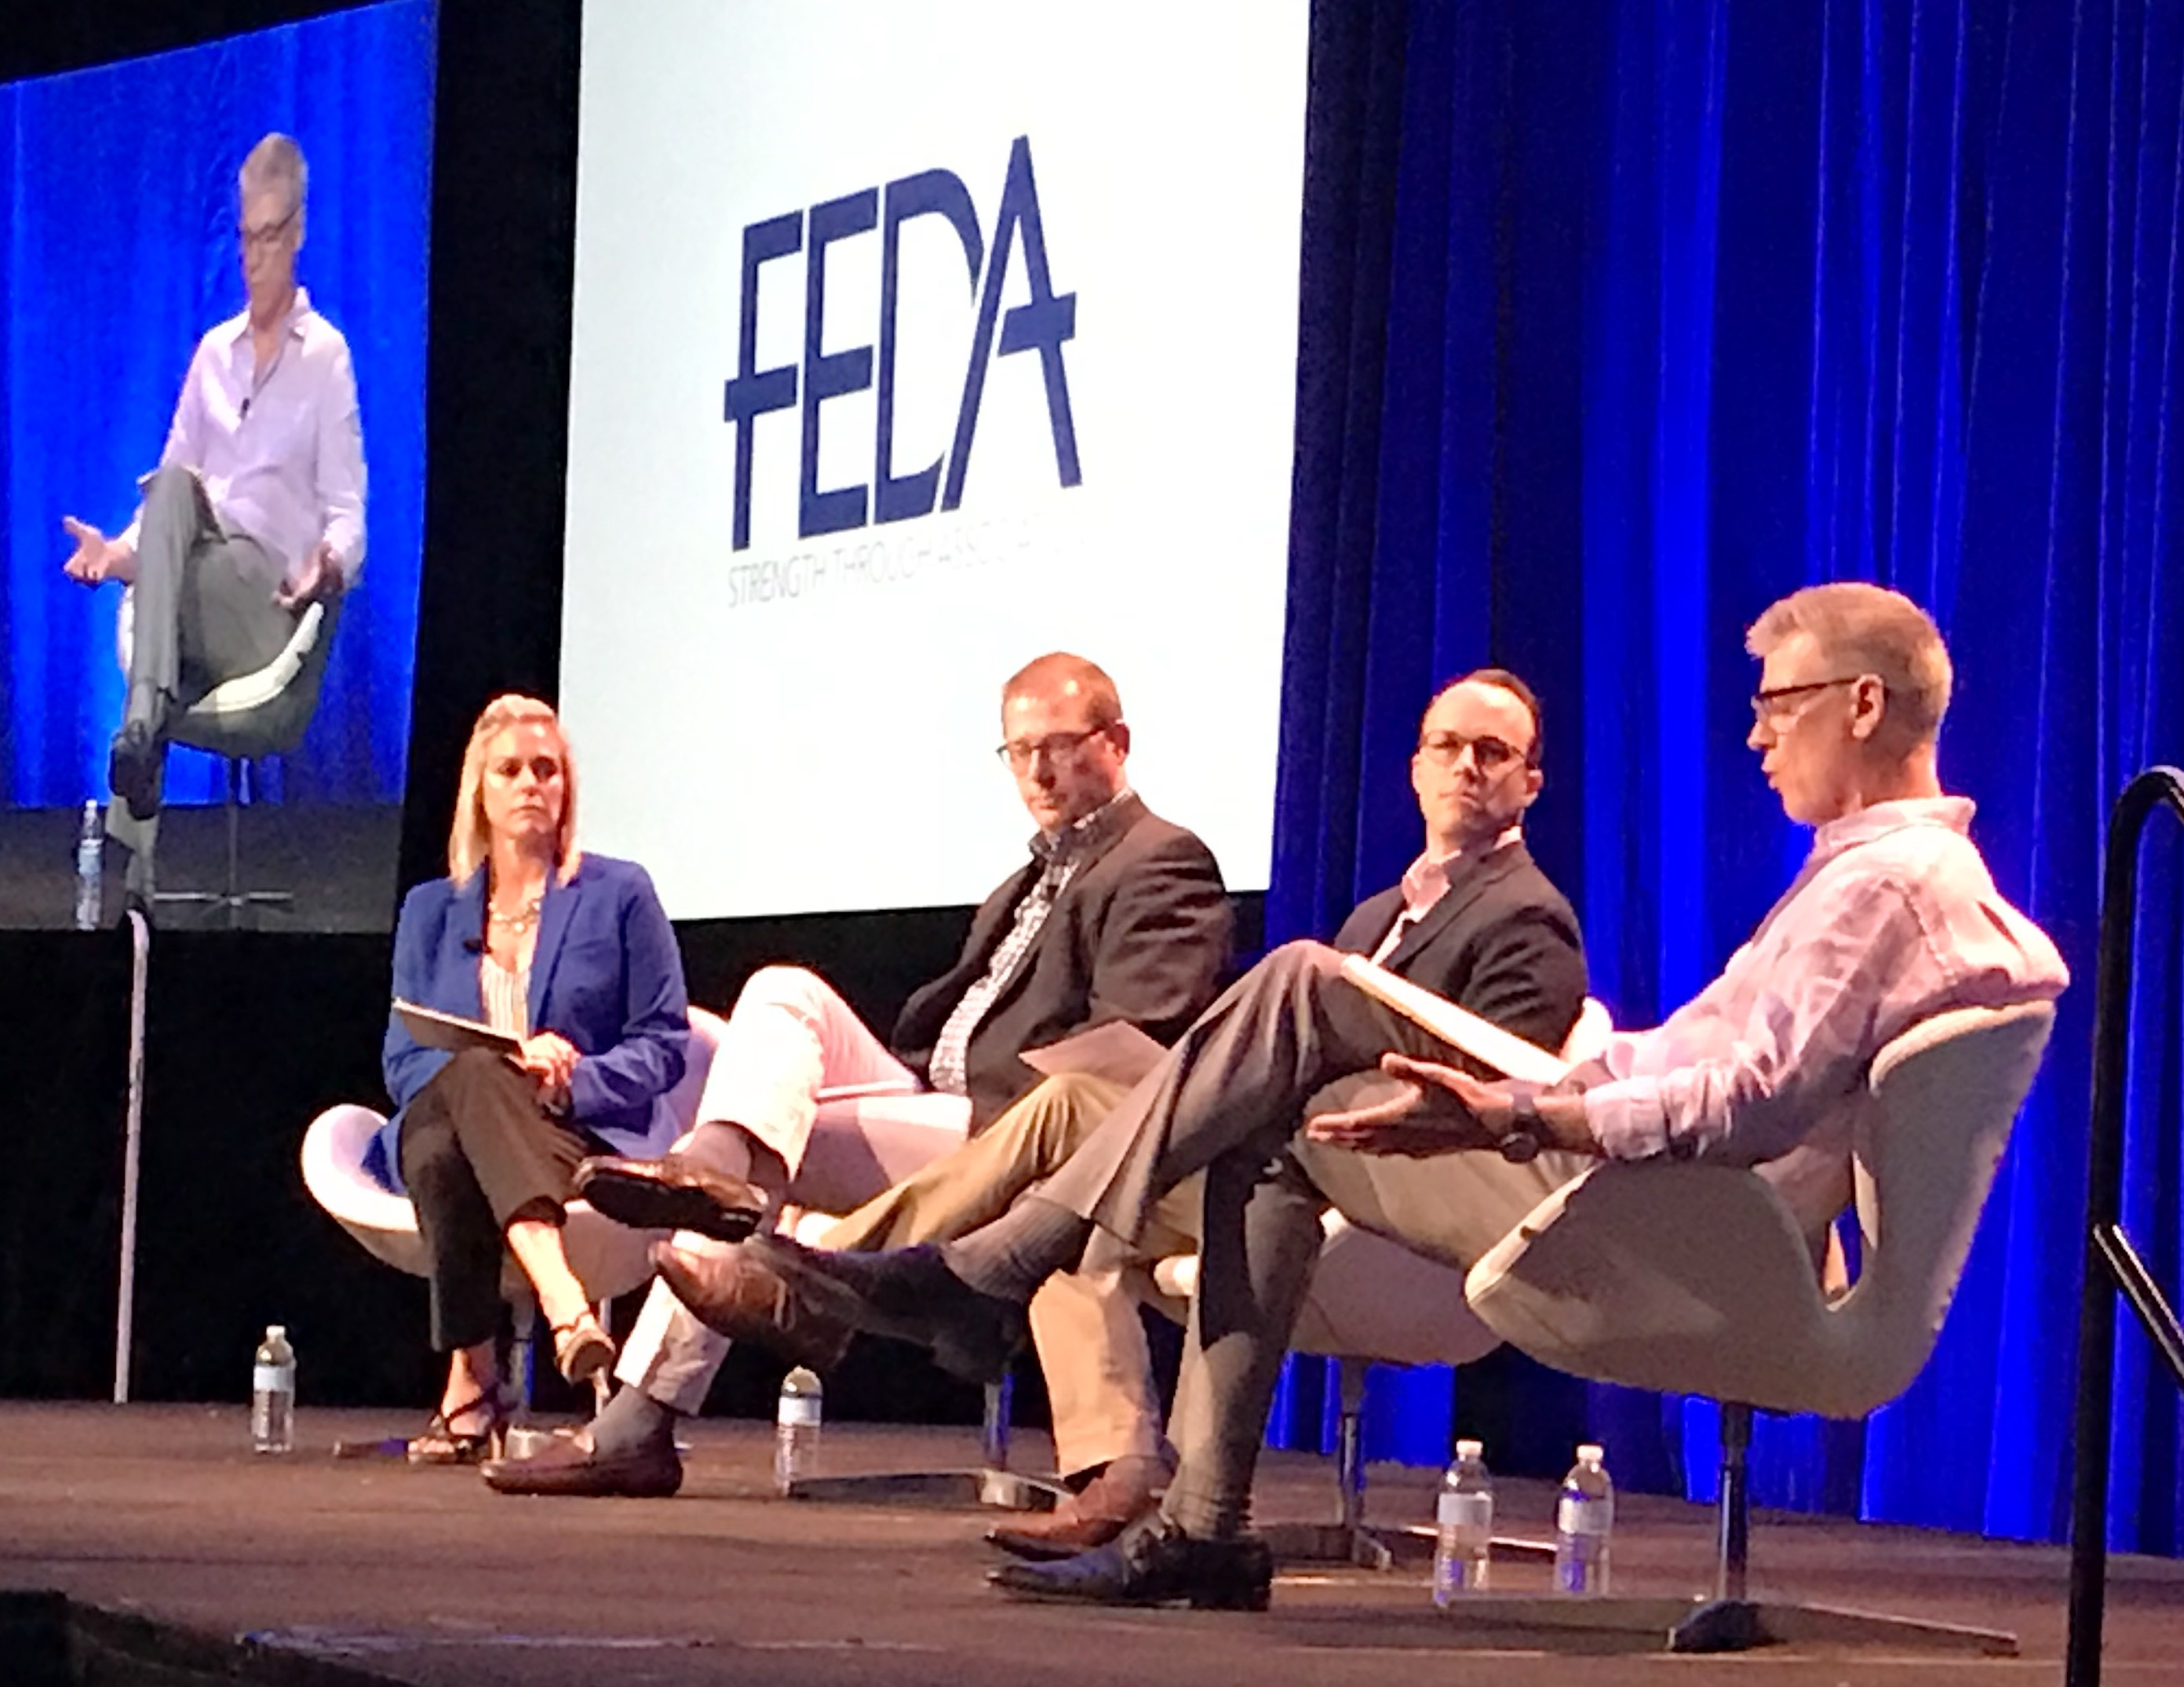 FEDA 2019 Distributors Conference